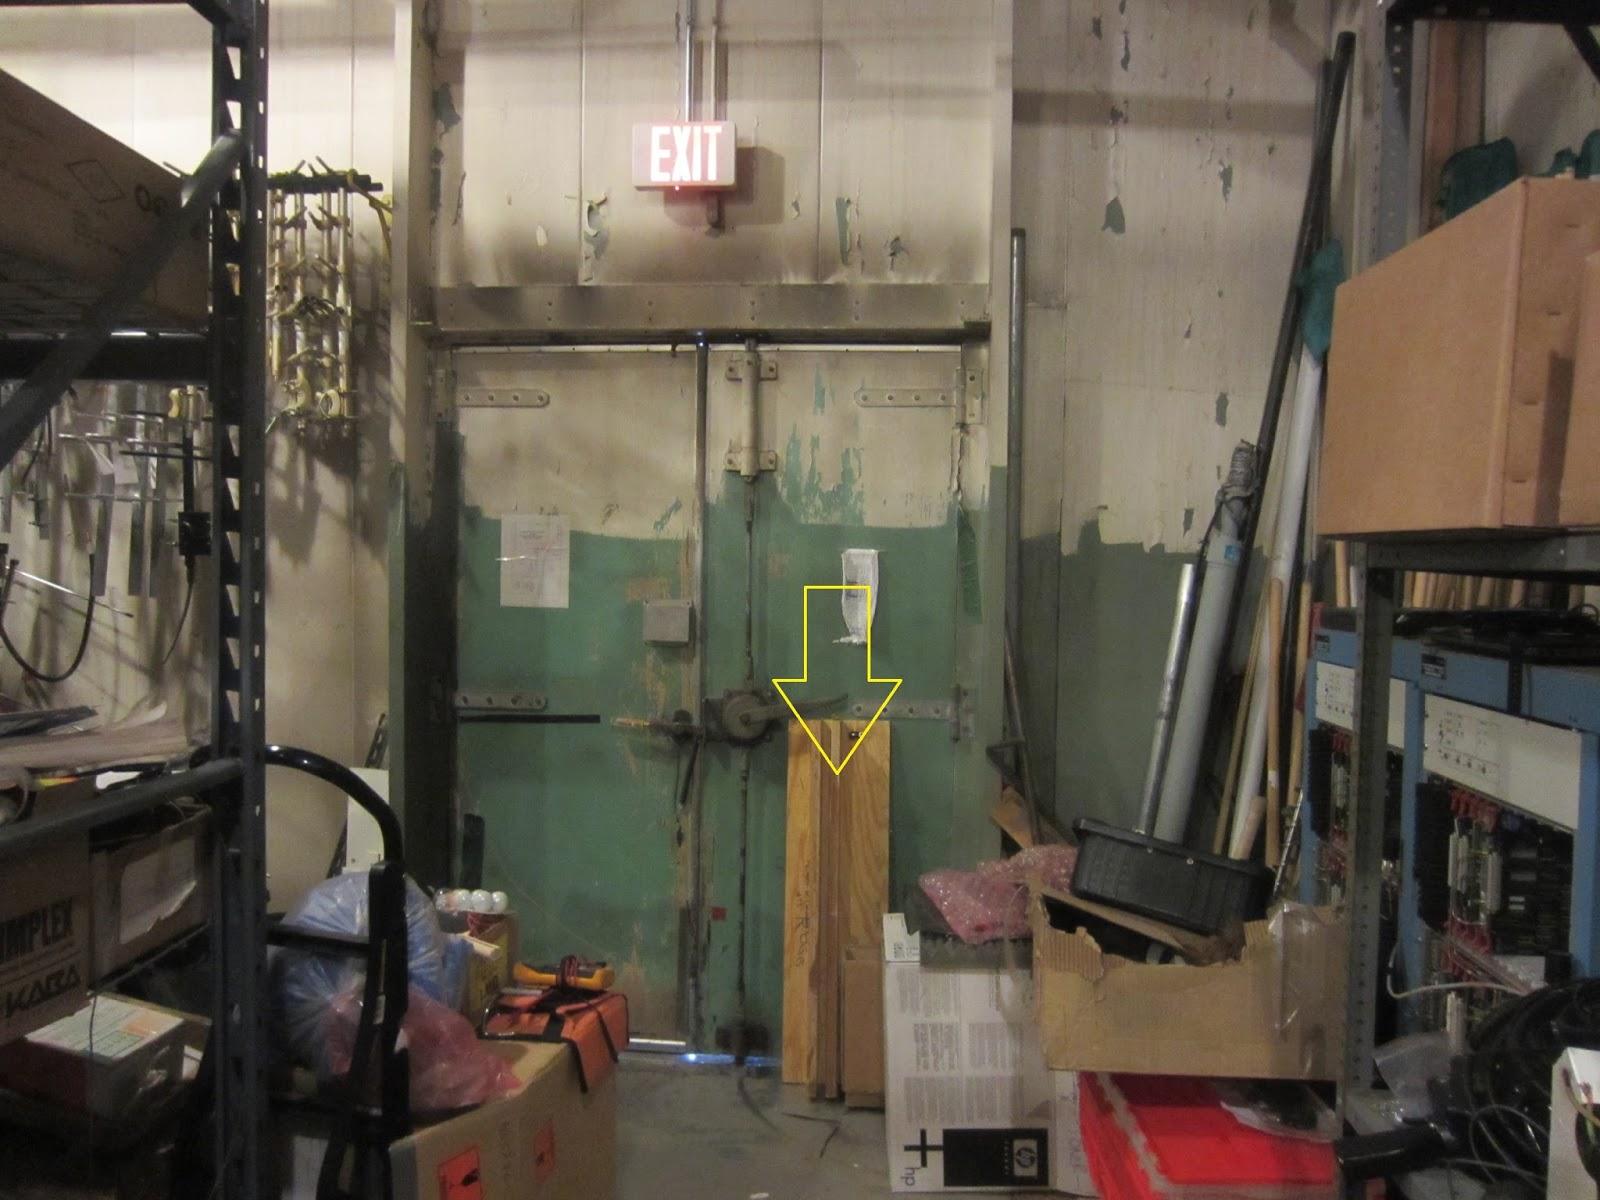 Fire Protection Deficiencies Blocked Exits